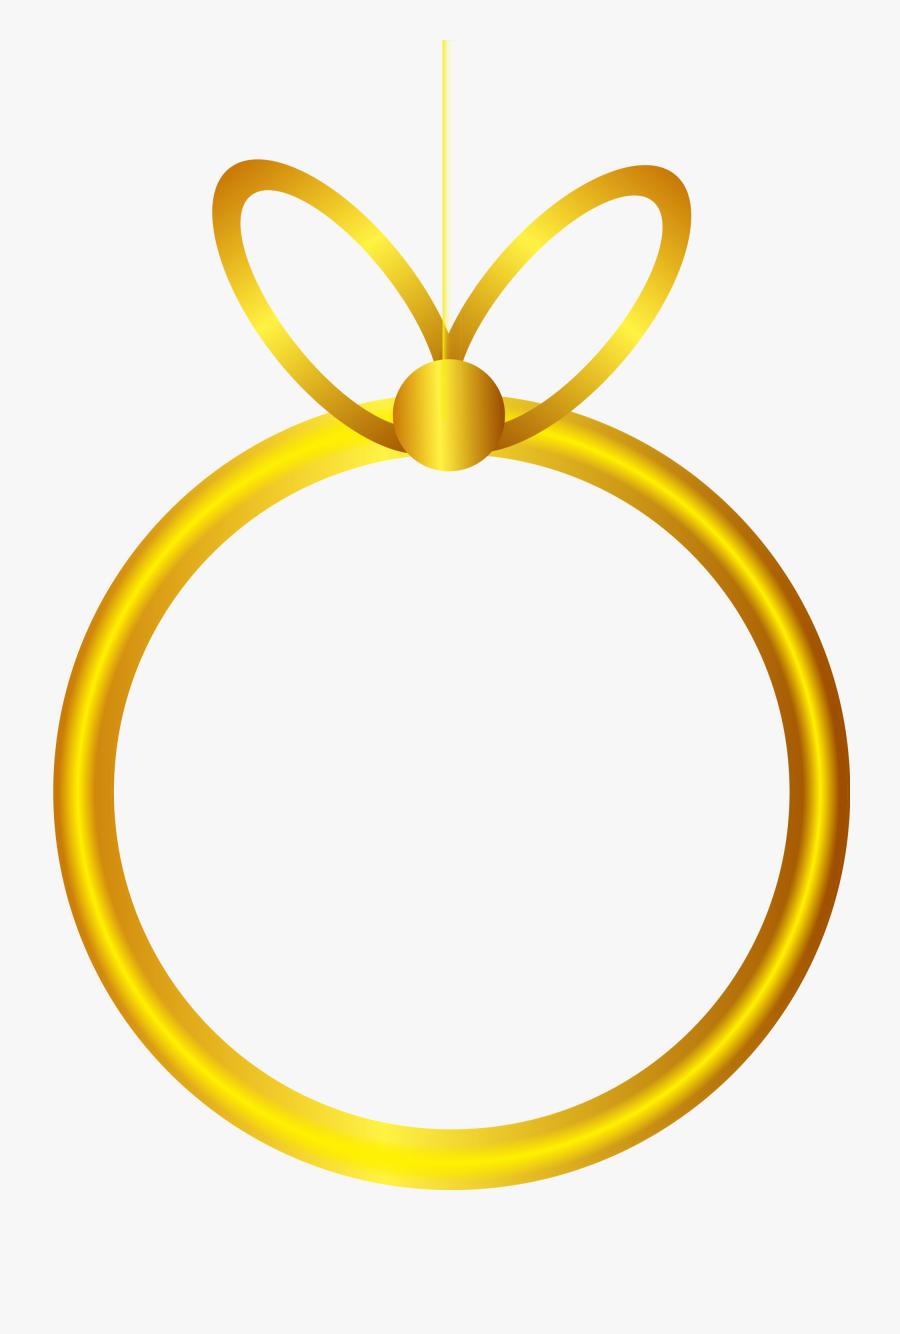 Clip Art Knot Designer Clip Art, Transparent Clipart